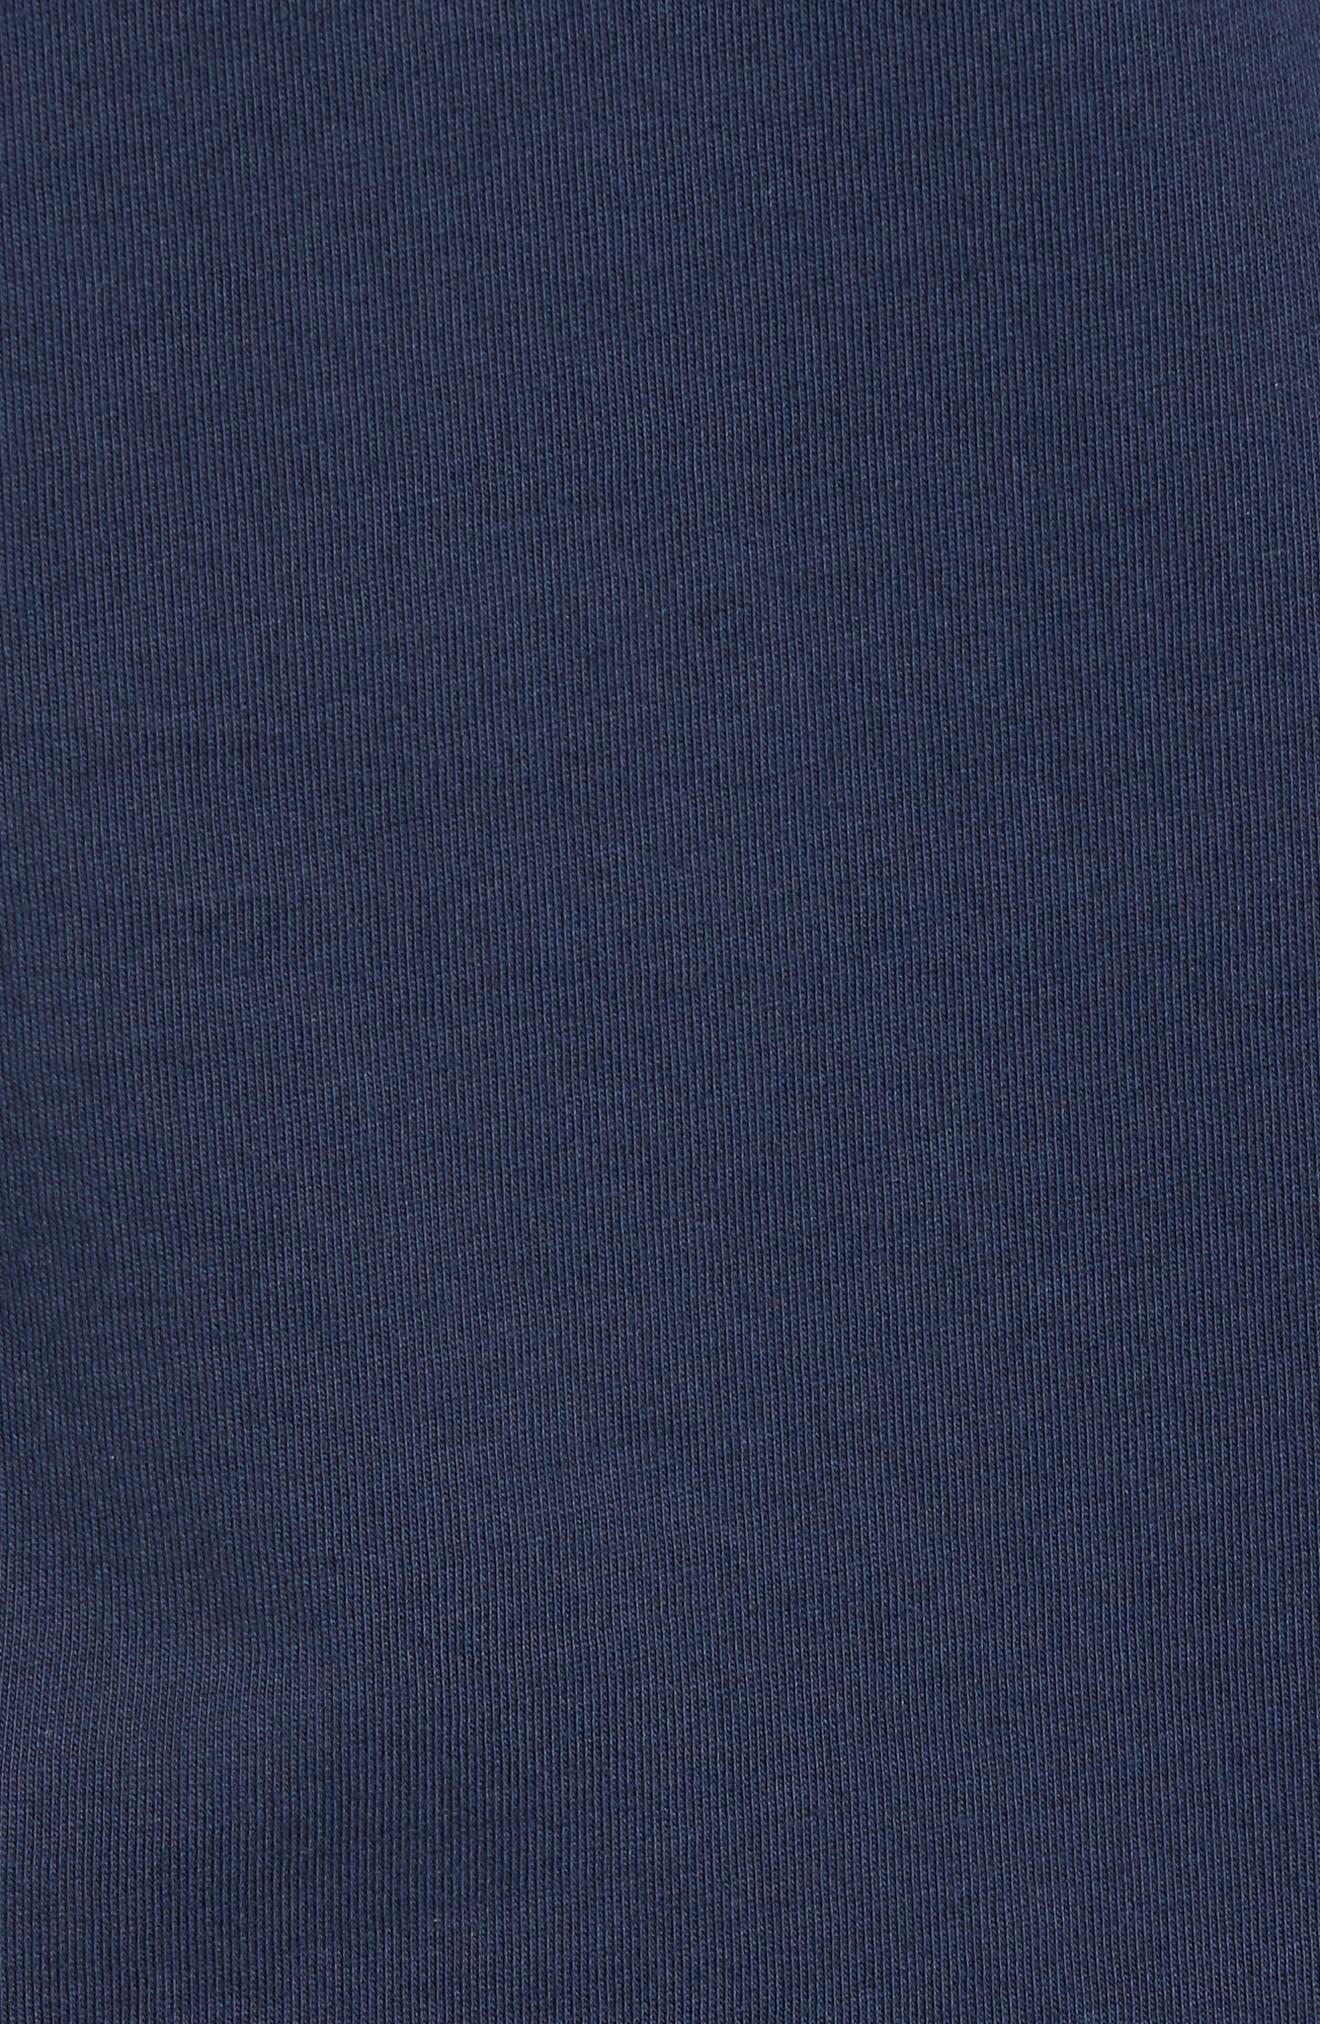 Alternate Image 5  - vineyard vines Turkey Whale Graphic Long Sleeve Pocket T-Shirt